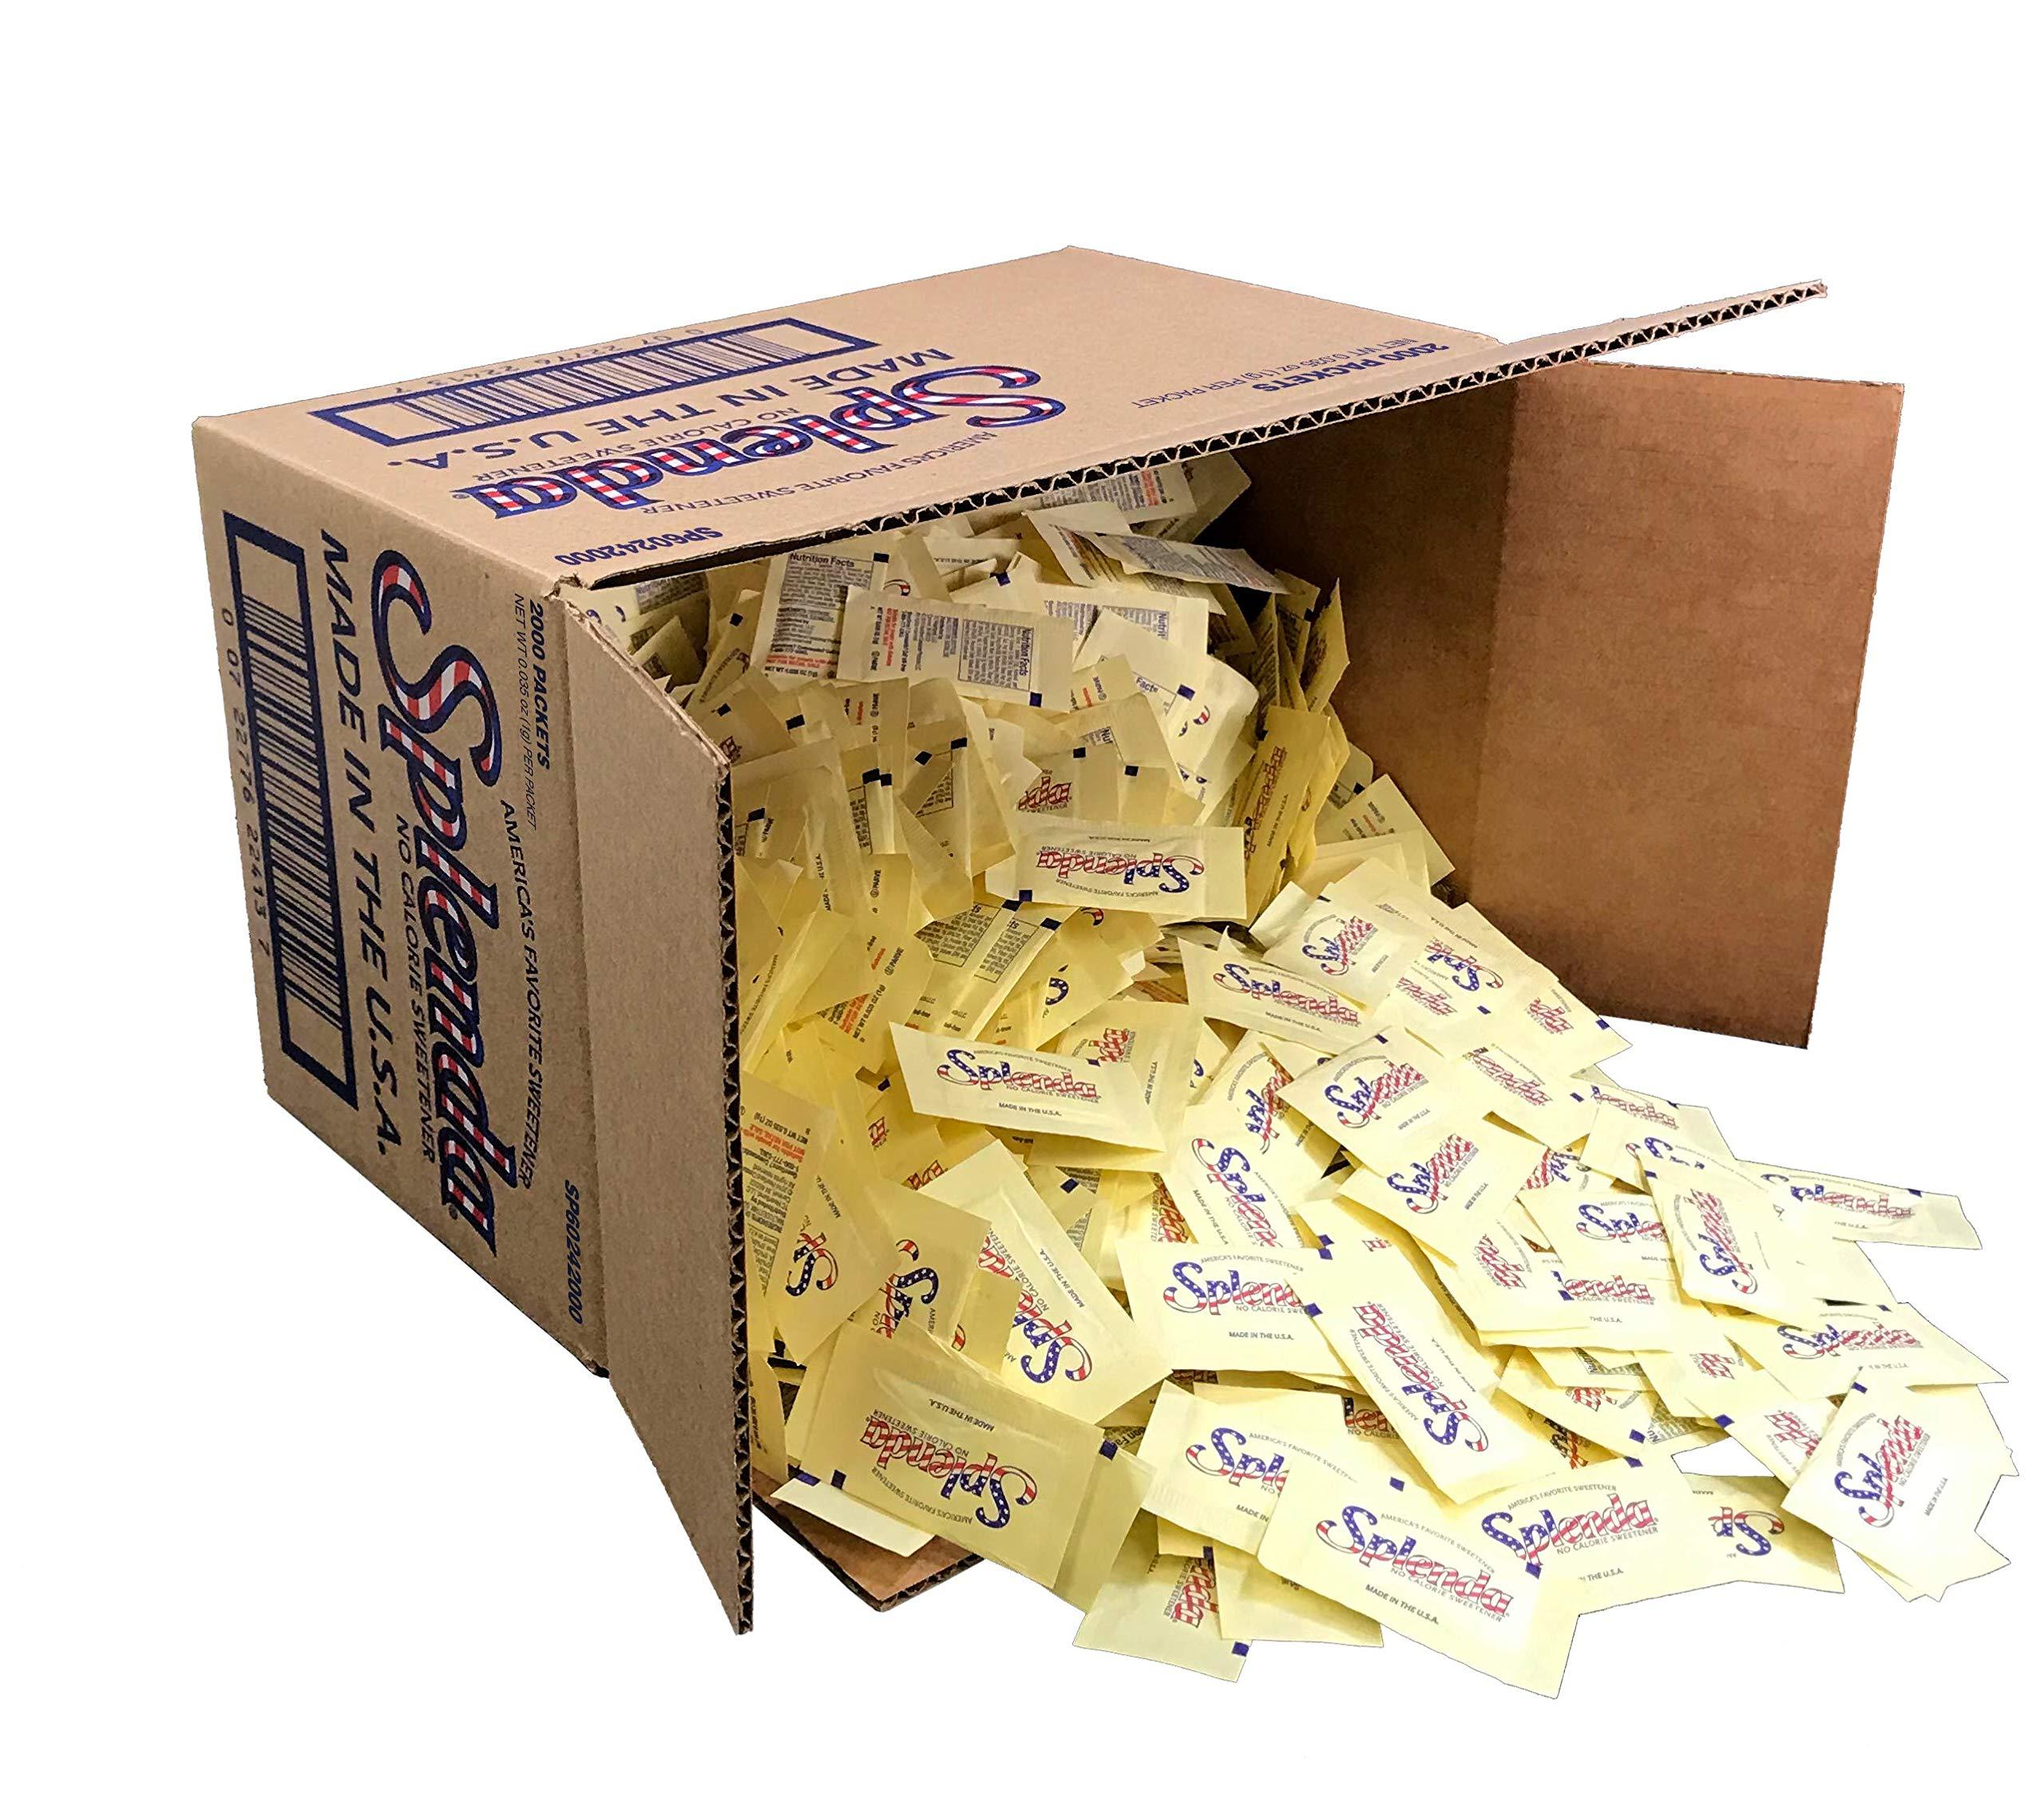 SPLENDA No Calorie Sweetener, Single-Serve Packets (2000 Count) by Splenda